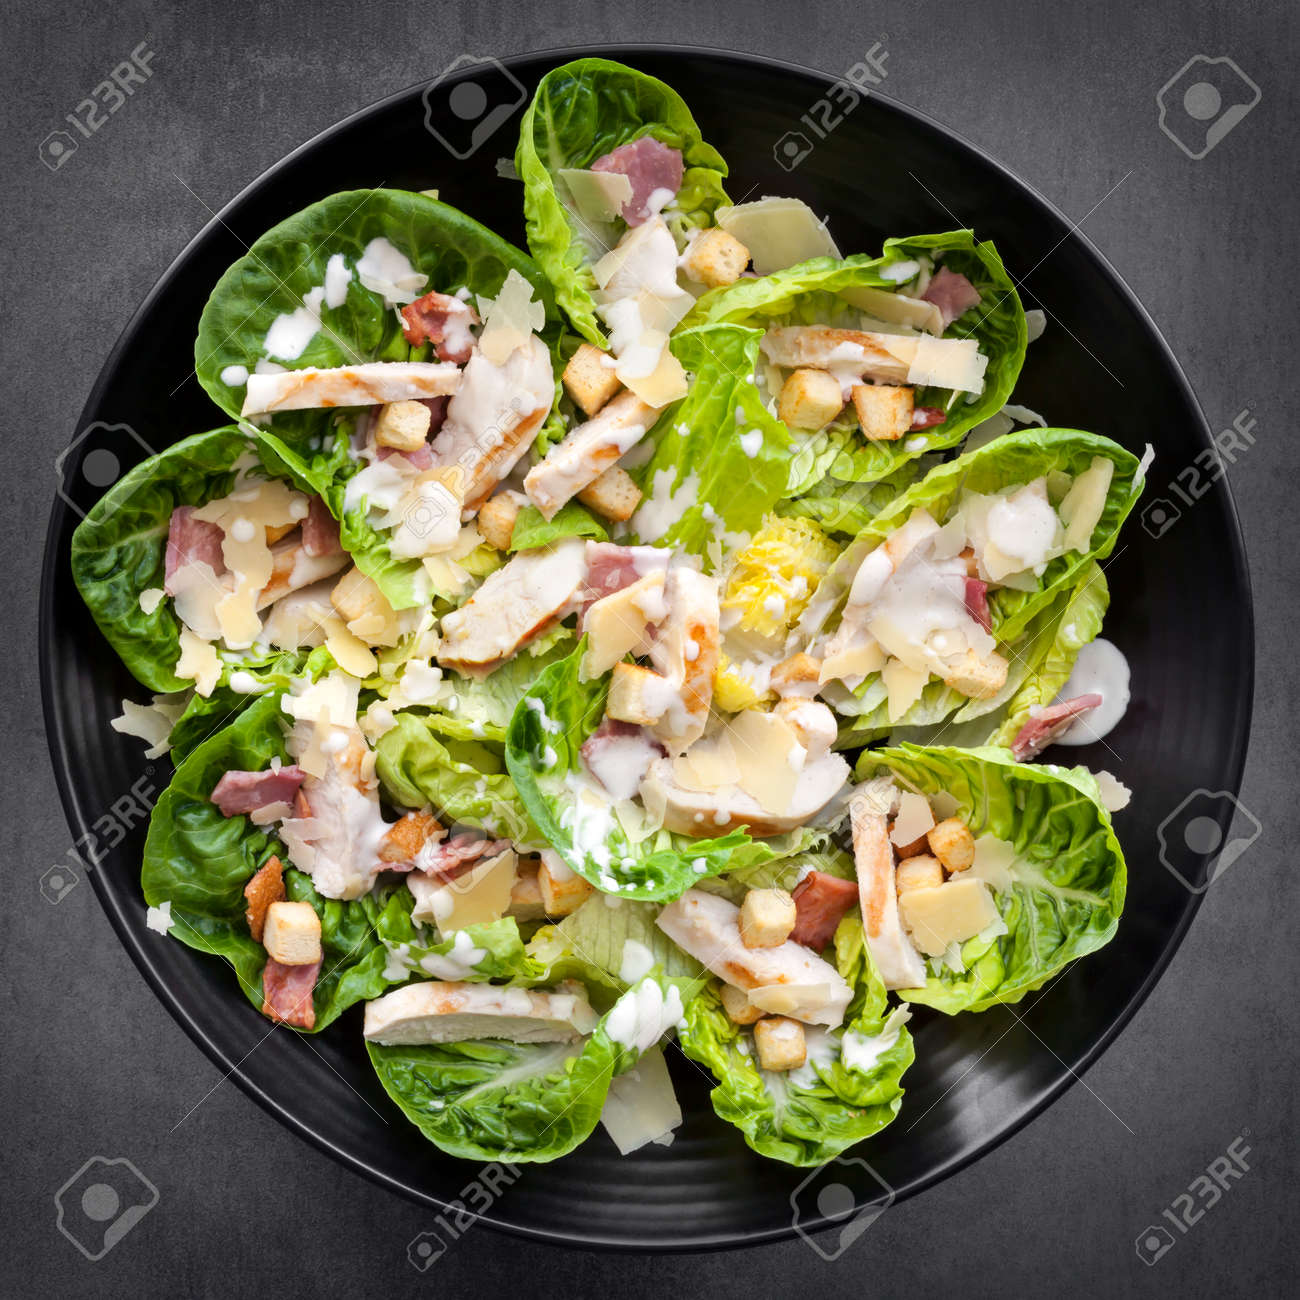 Chicken Caesar salad on black plate over slate. Overhead view. - 32575746